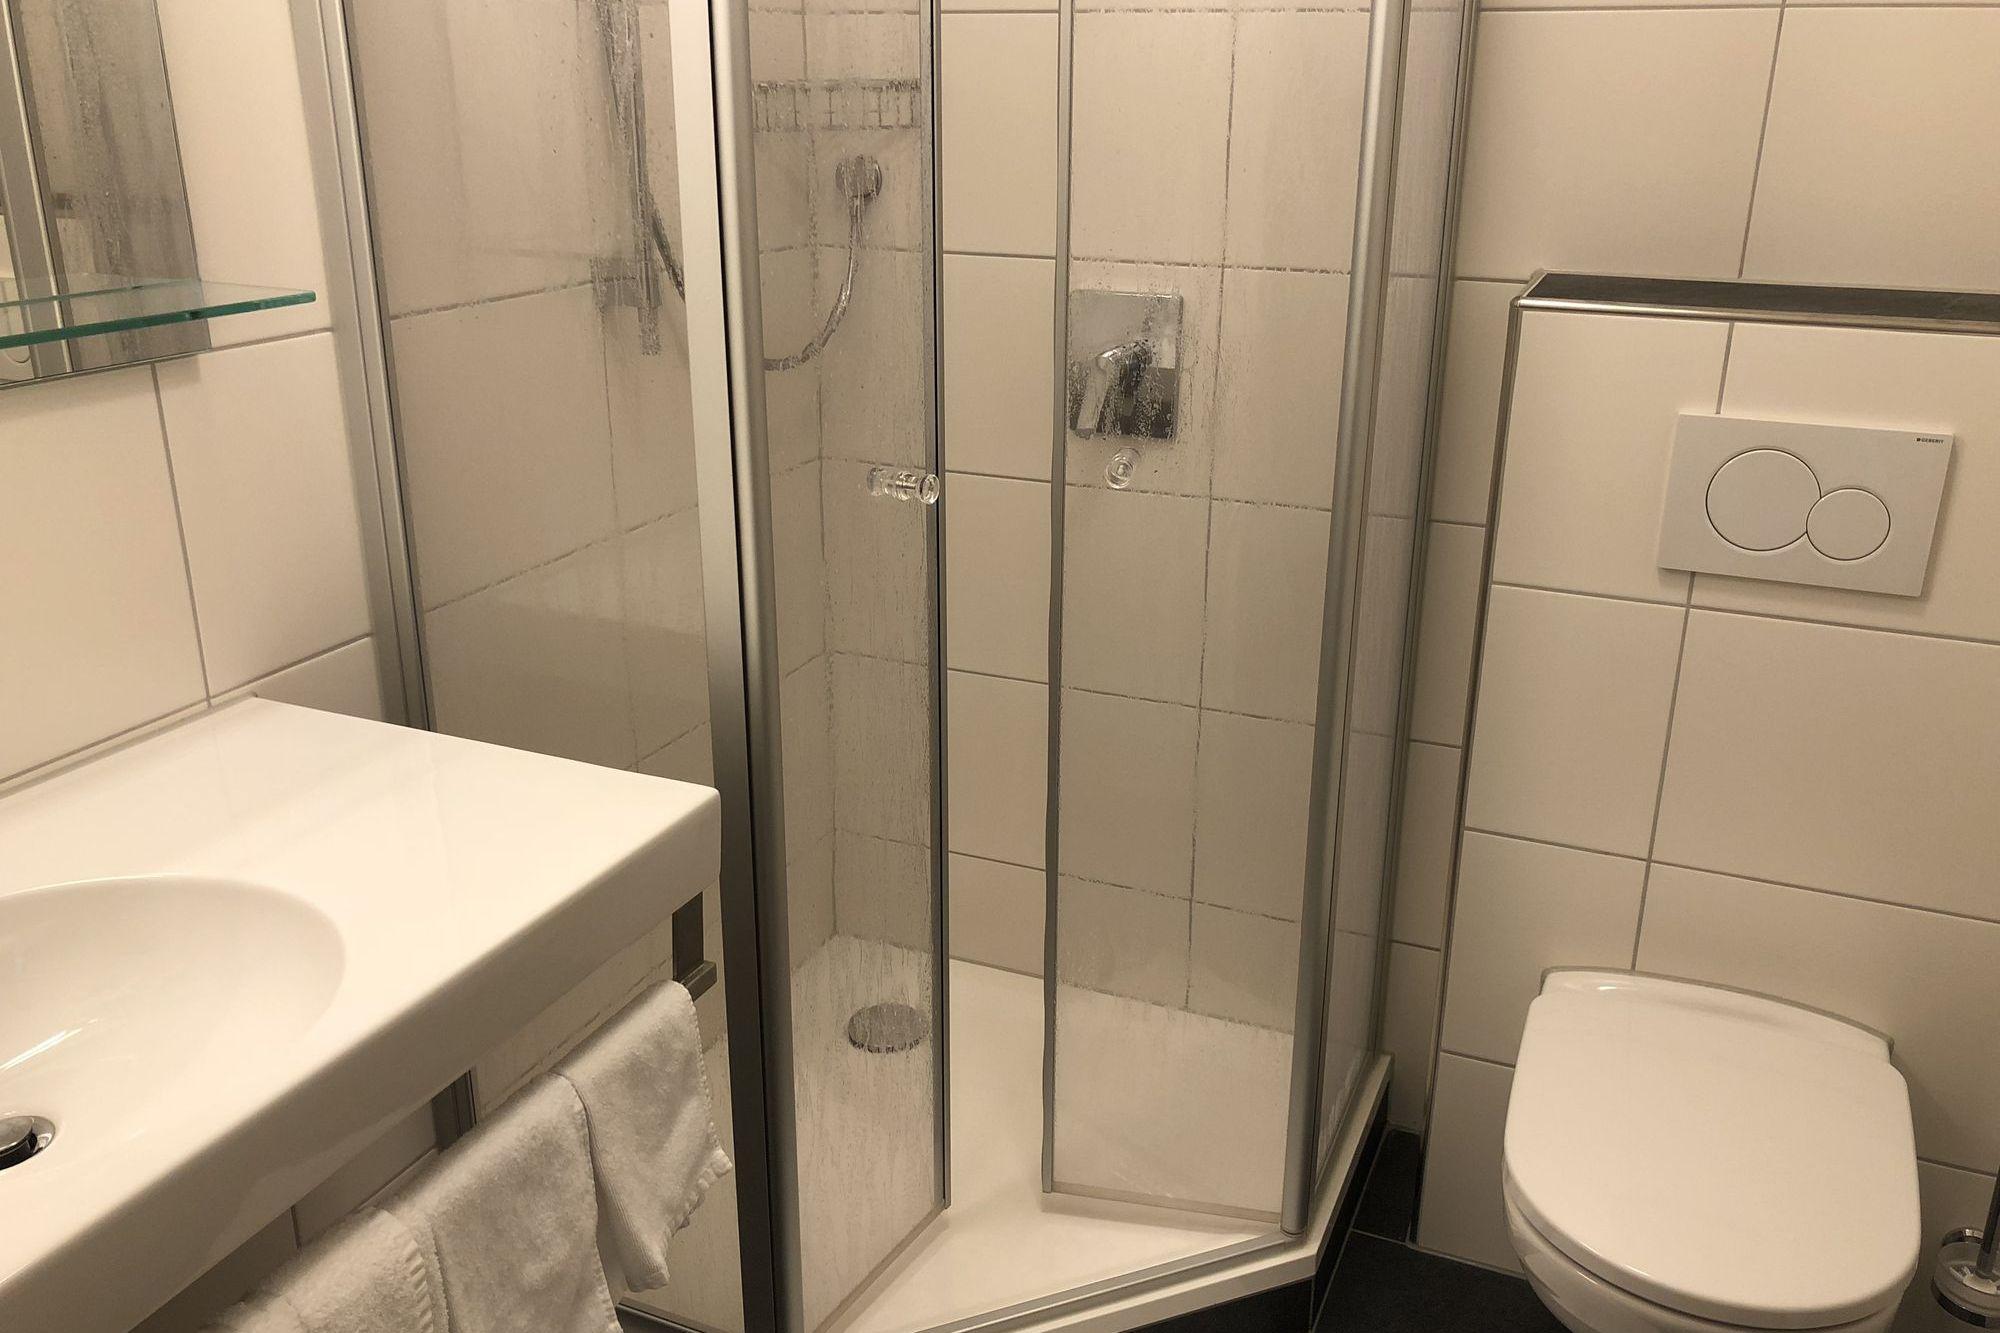 https://www.hotelbinder.de/wp-content/uploads/einzelzimmer2_4.jpg